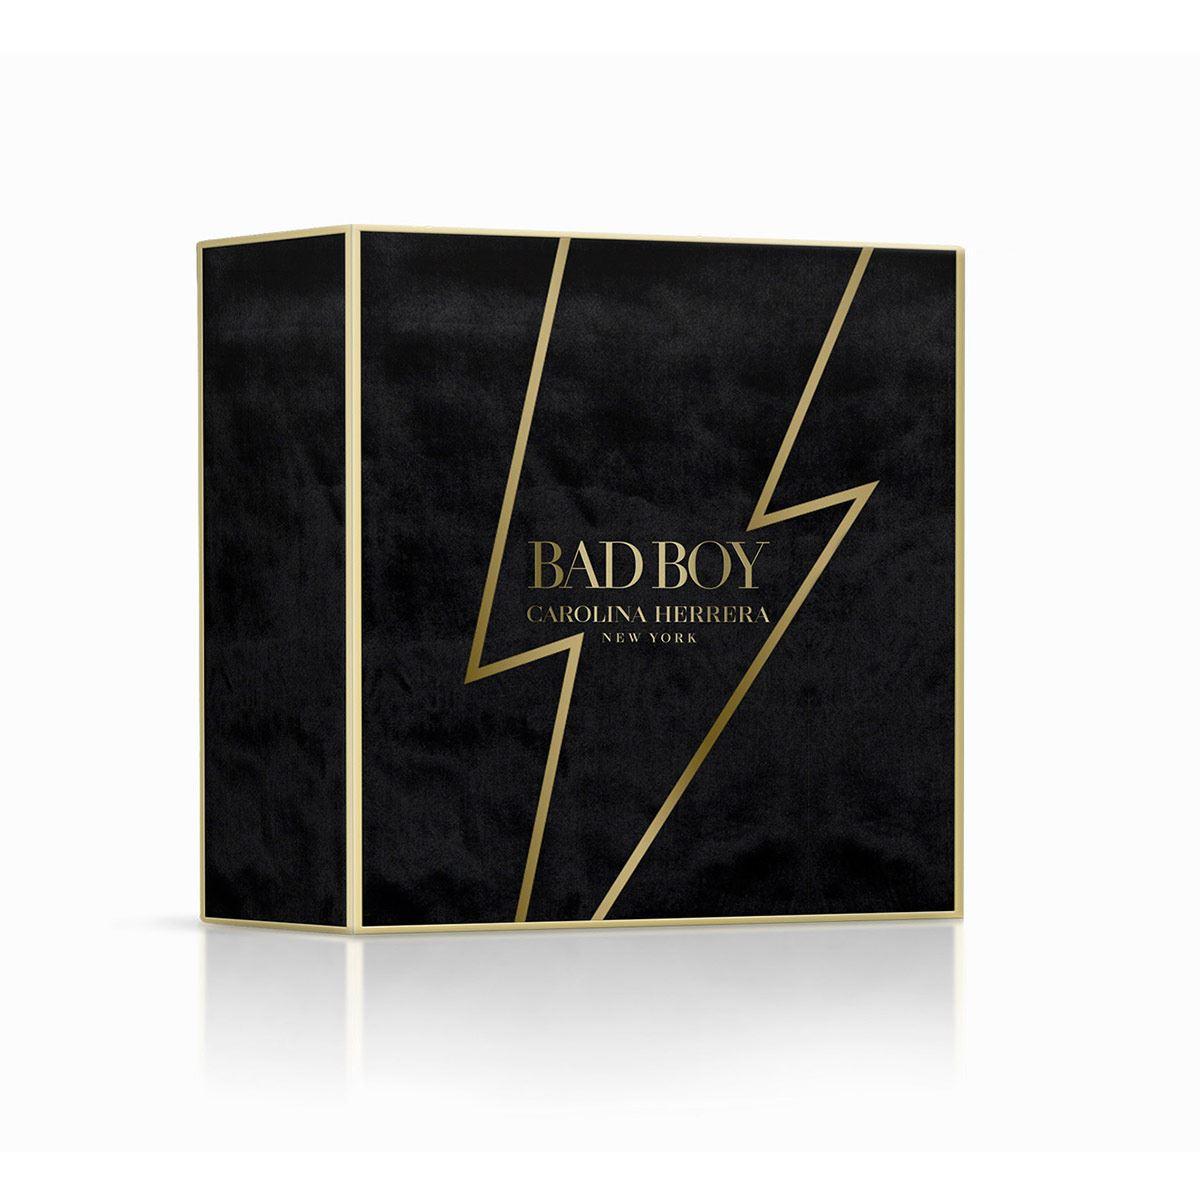 Set para caballero, Carolina Herrera, BAD BOY, EDT 100ML + Shower Gel 100 ML